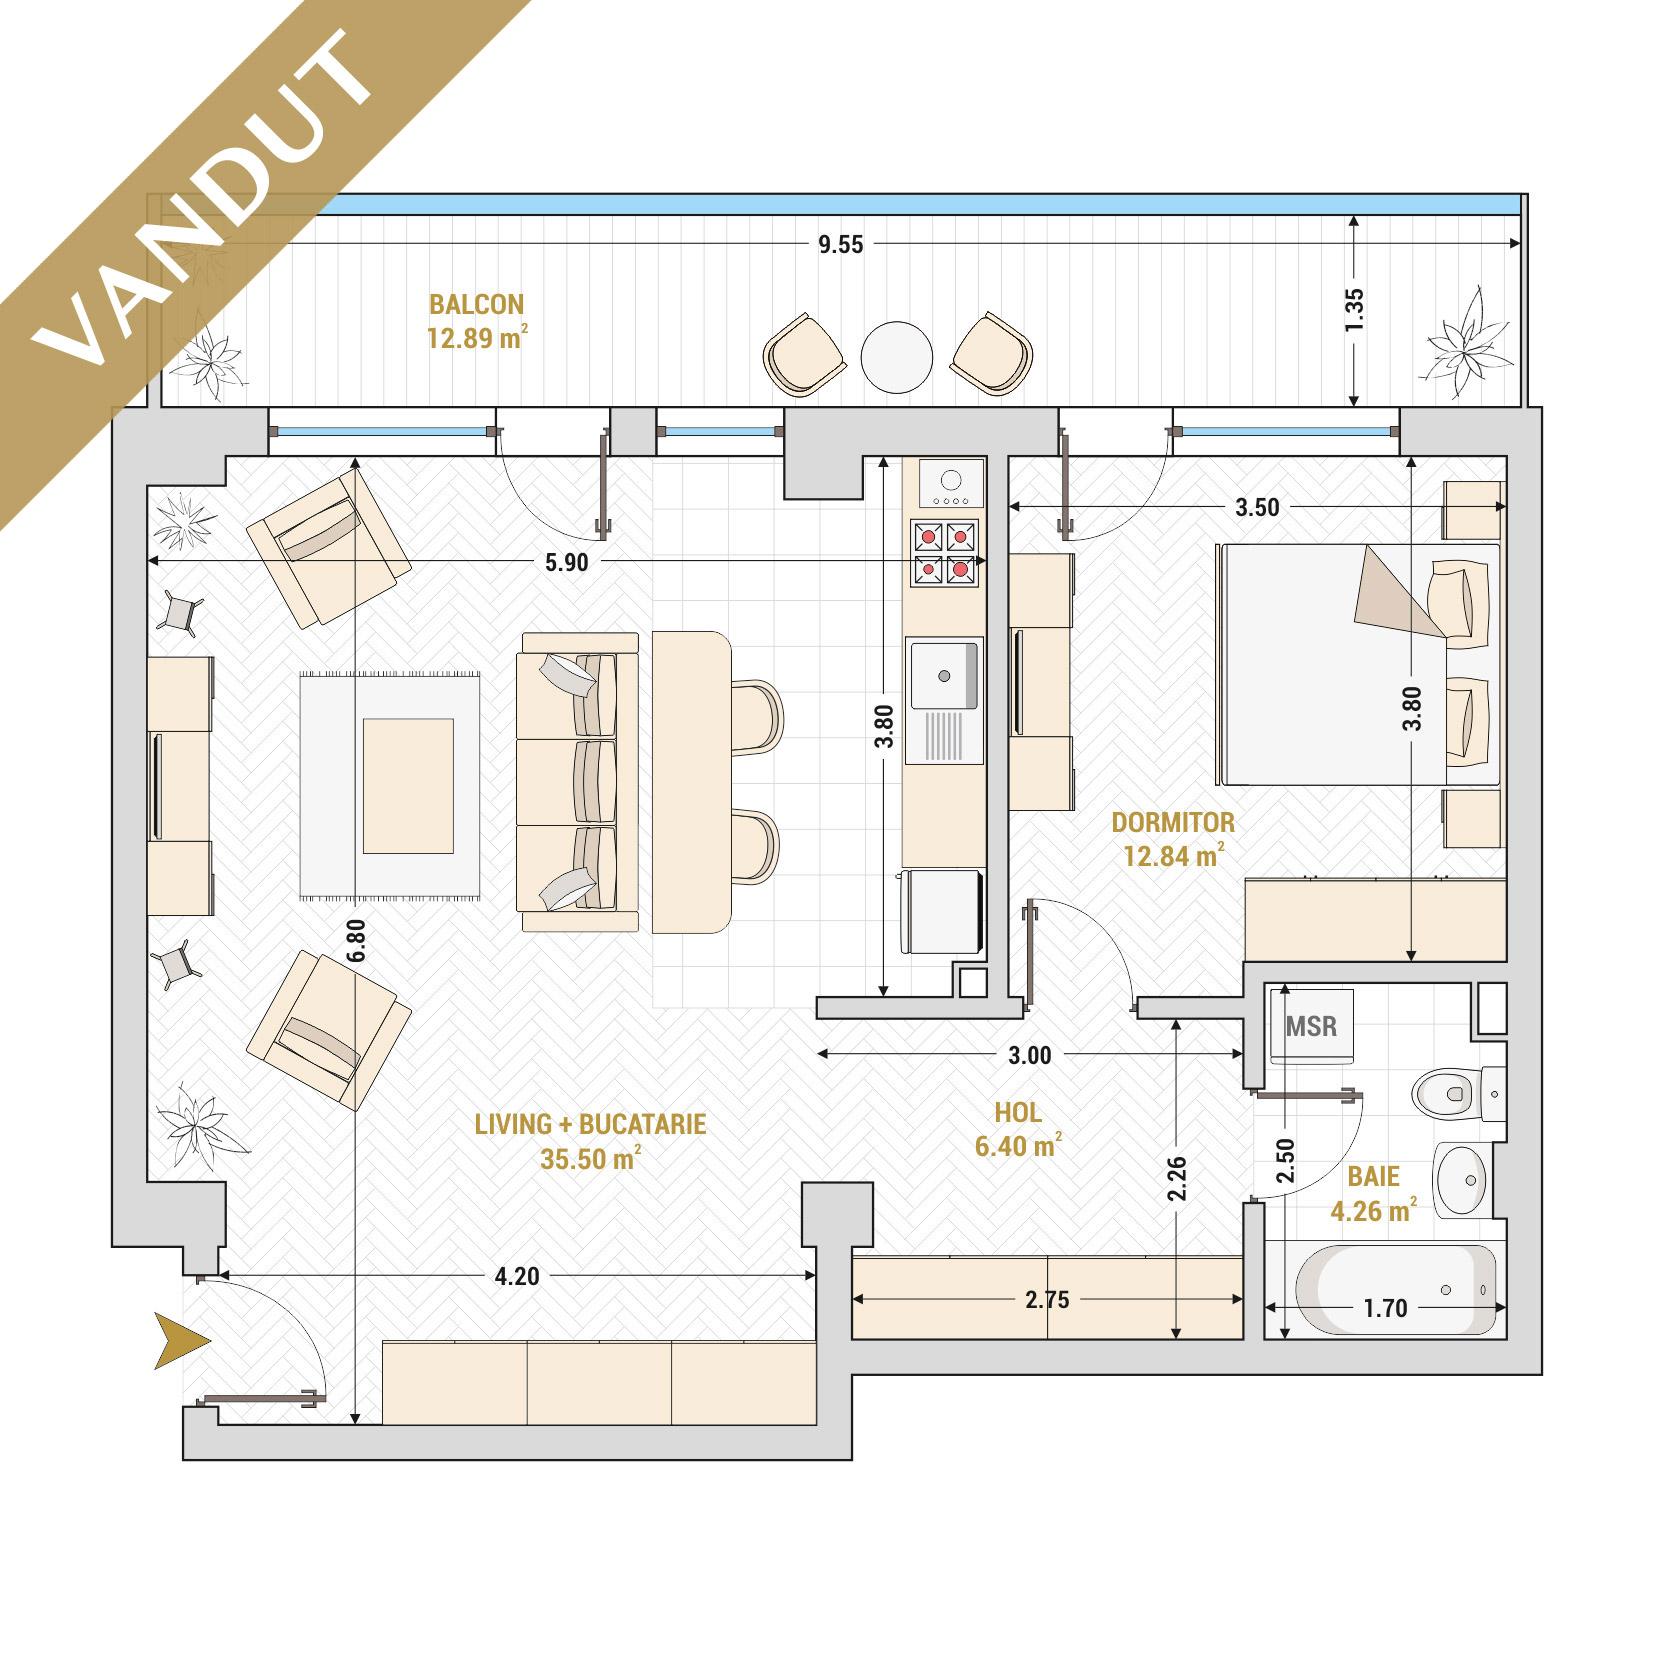 Apartament 2 camere de vanzare Bucuresti - Catedral Residence - Marriott, Piata Unirii, 13 Septembrie, Izvor - Tip 6B - T1 - V